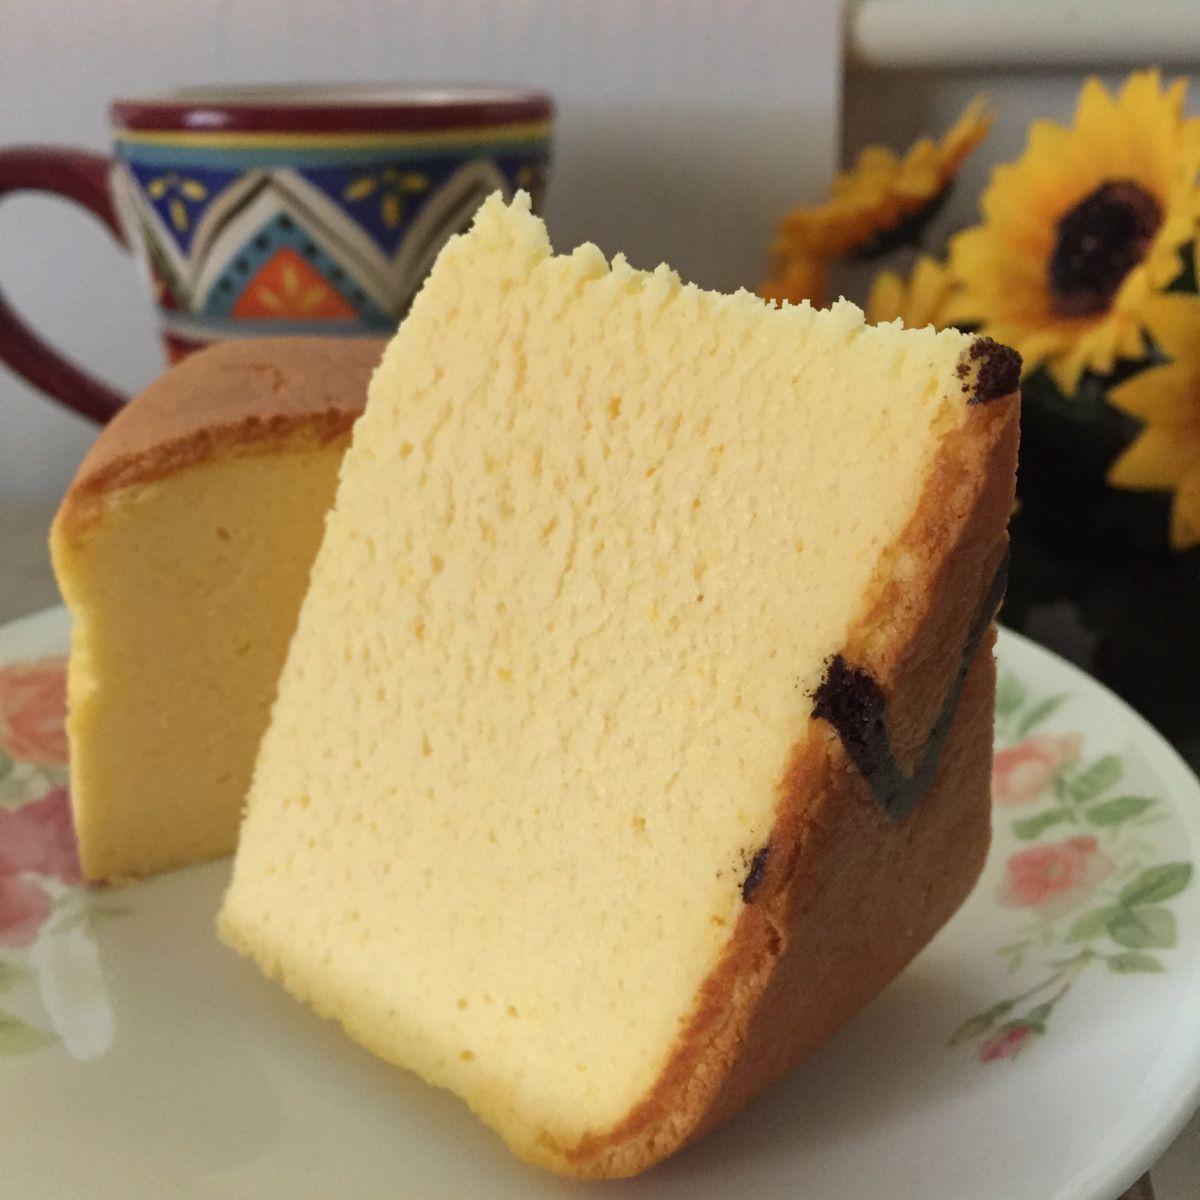 Pumpkin Cheesecake Ingredients: 250g cream cheese 120g pumpkin flesh (steamed and mashed, nett weight) 5 egg yolks 60g castor sugar 60g butter 150g full cream milk 50g cake flour 20g cornflour 1/4 tsp salt 1 tsp Vani…